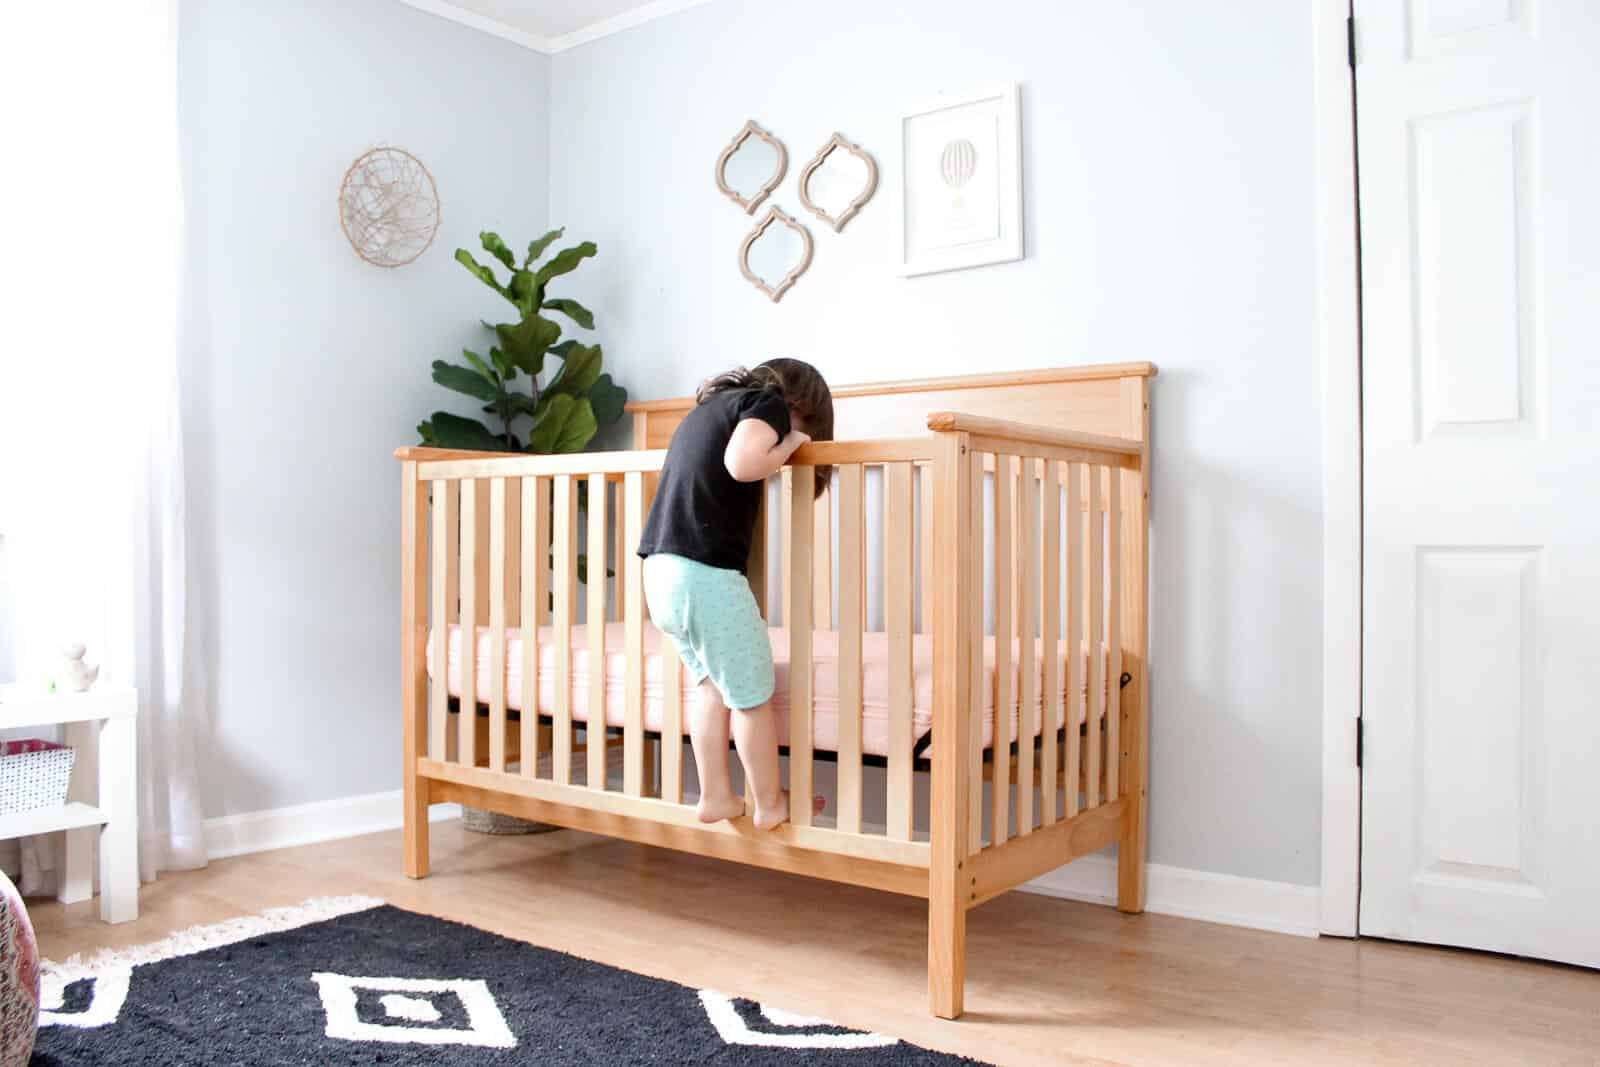 Toddler girl climbs into crib in nursery room.